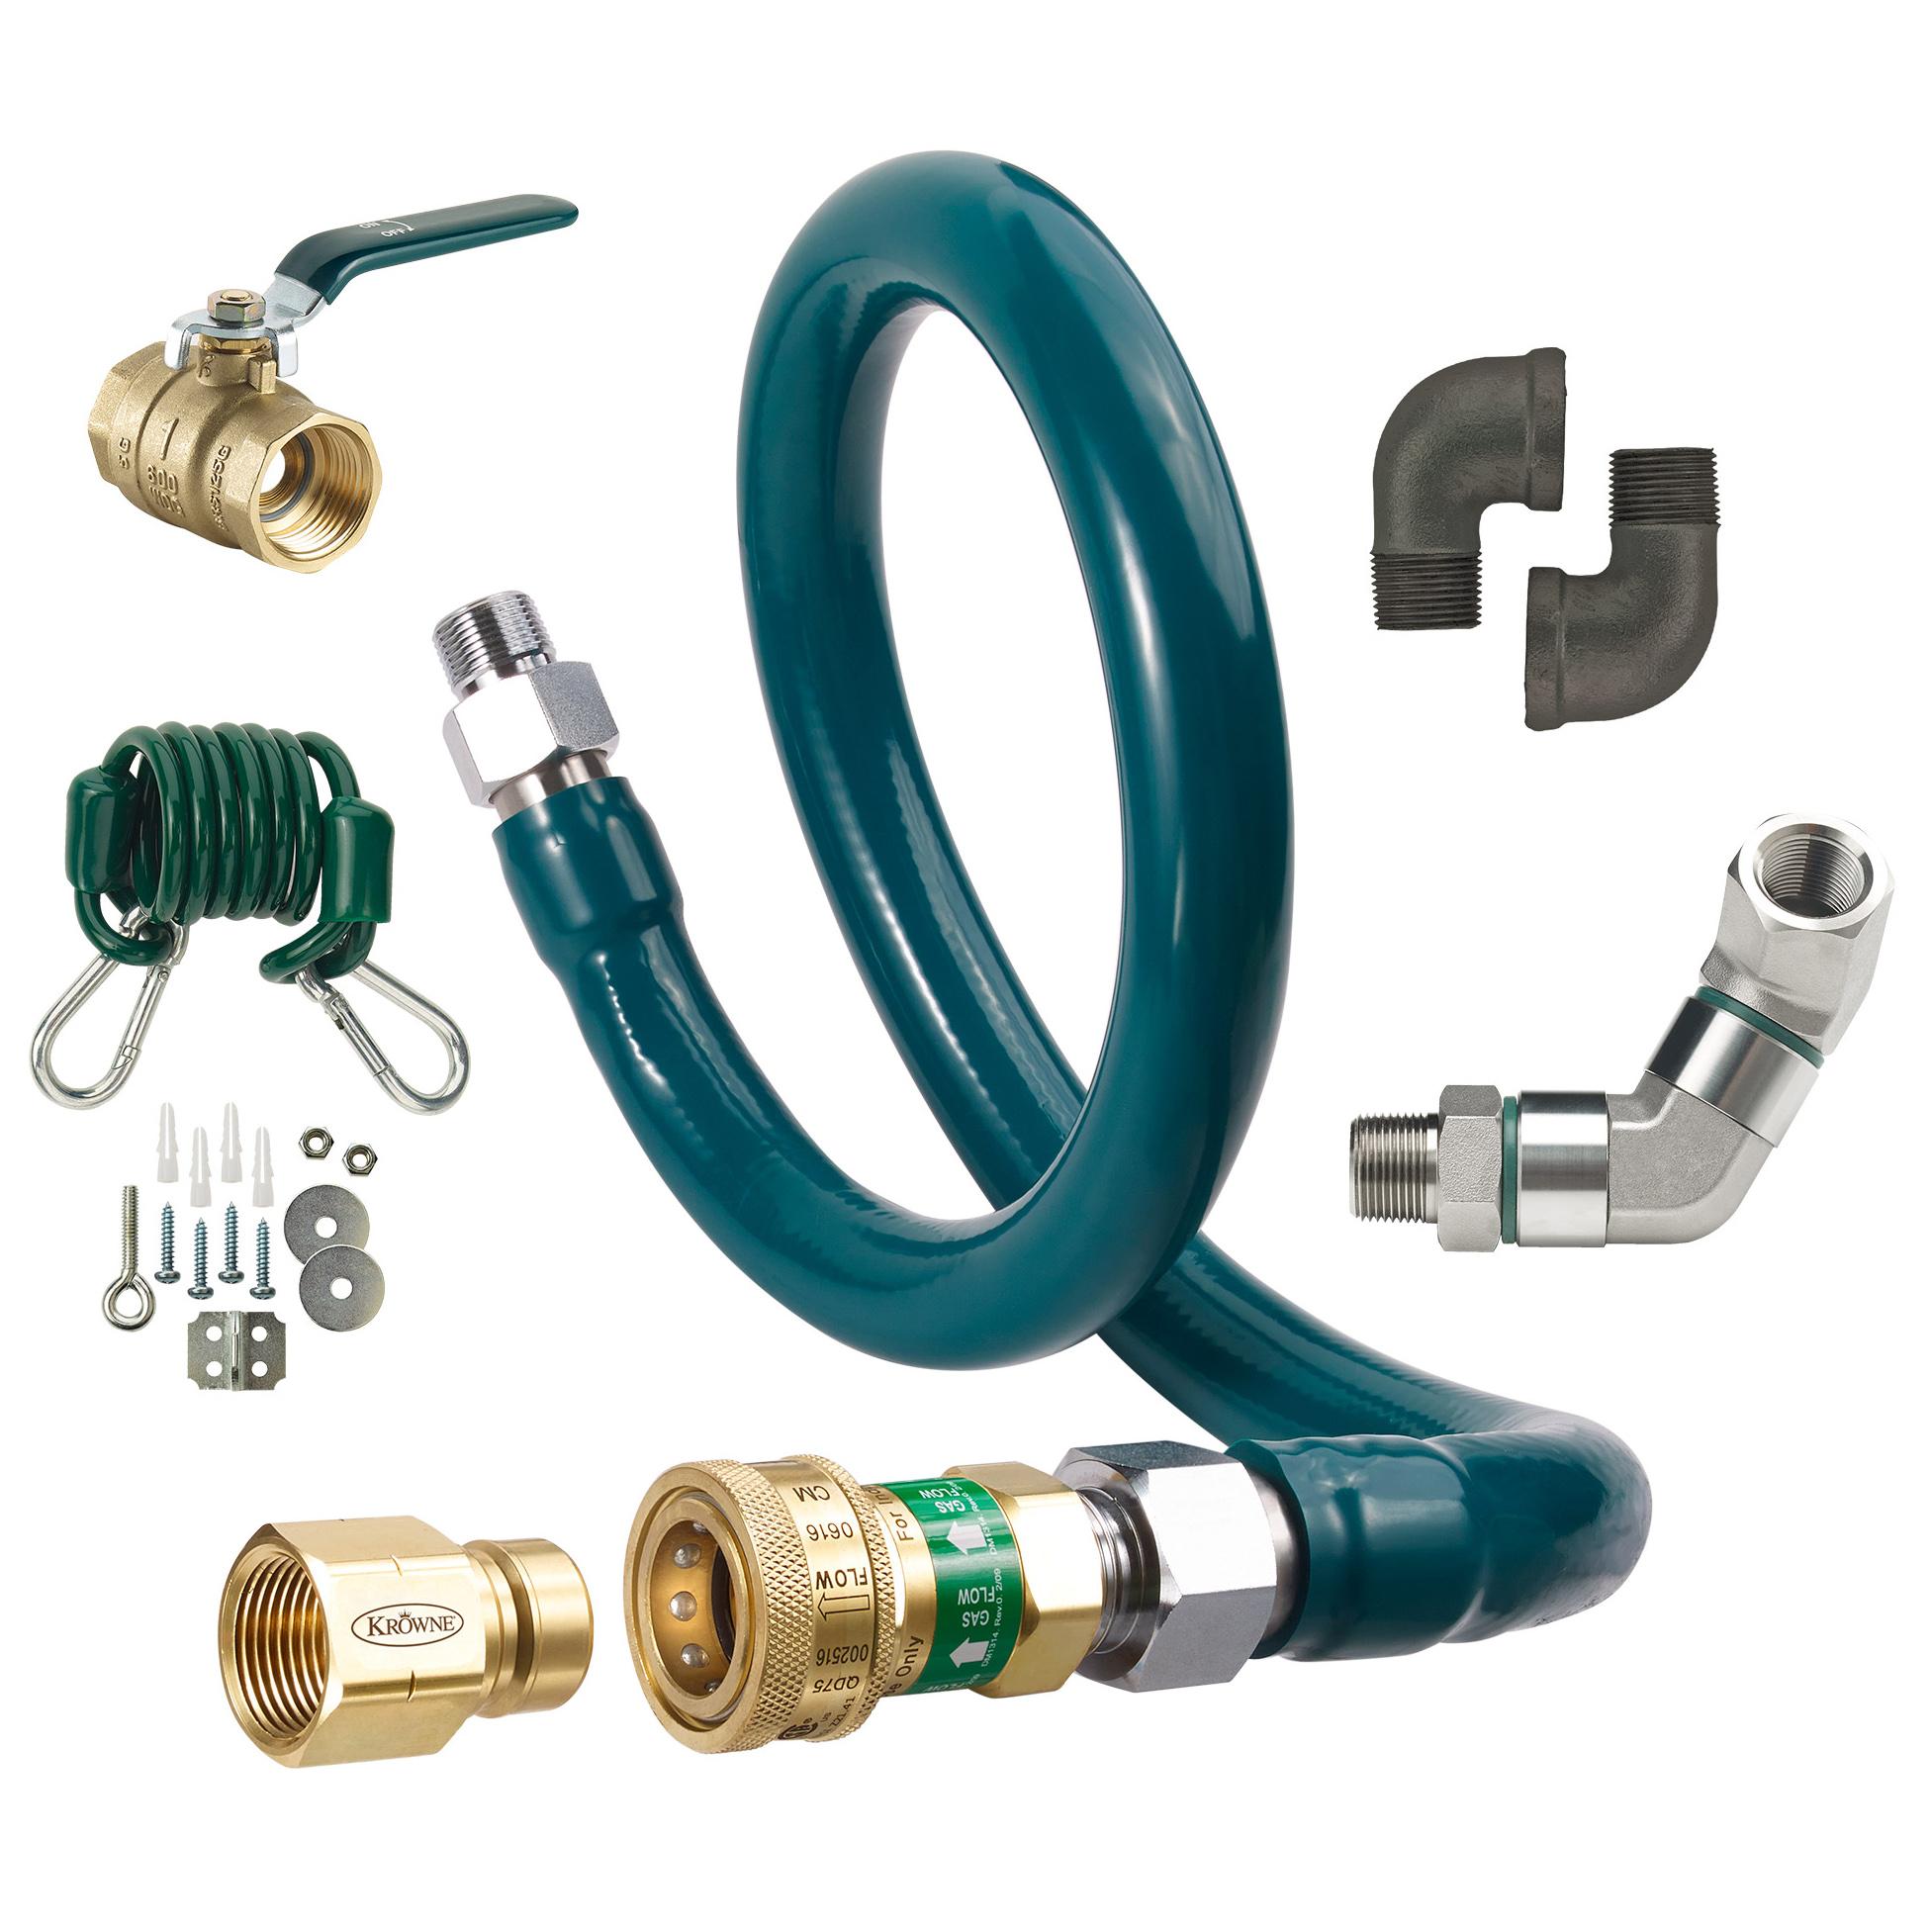 Krowne Metal M10036K9 gas connector hose kit